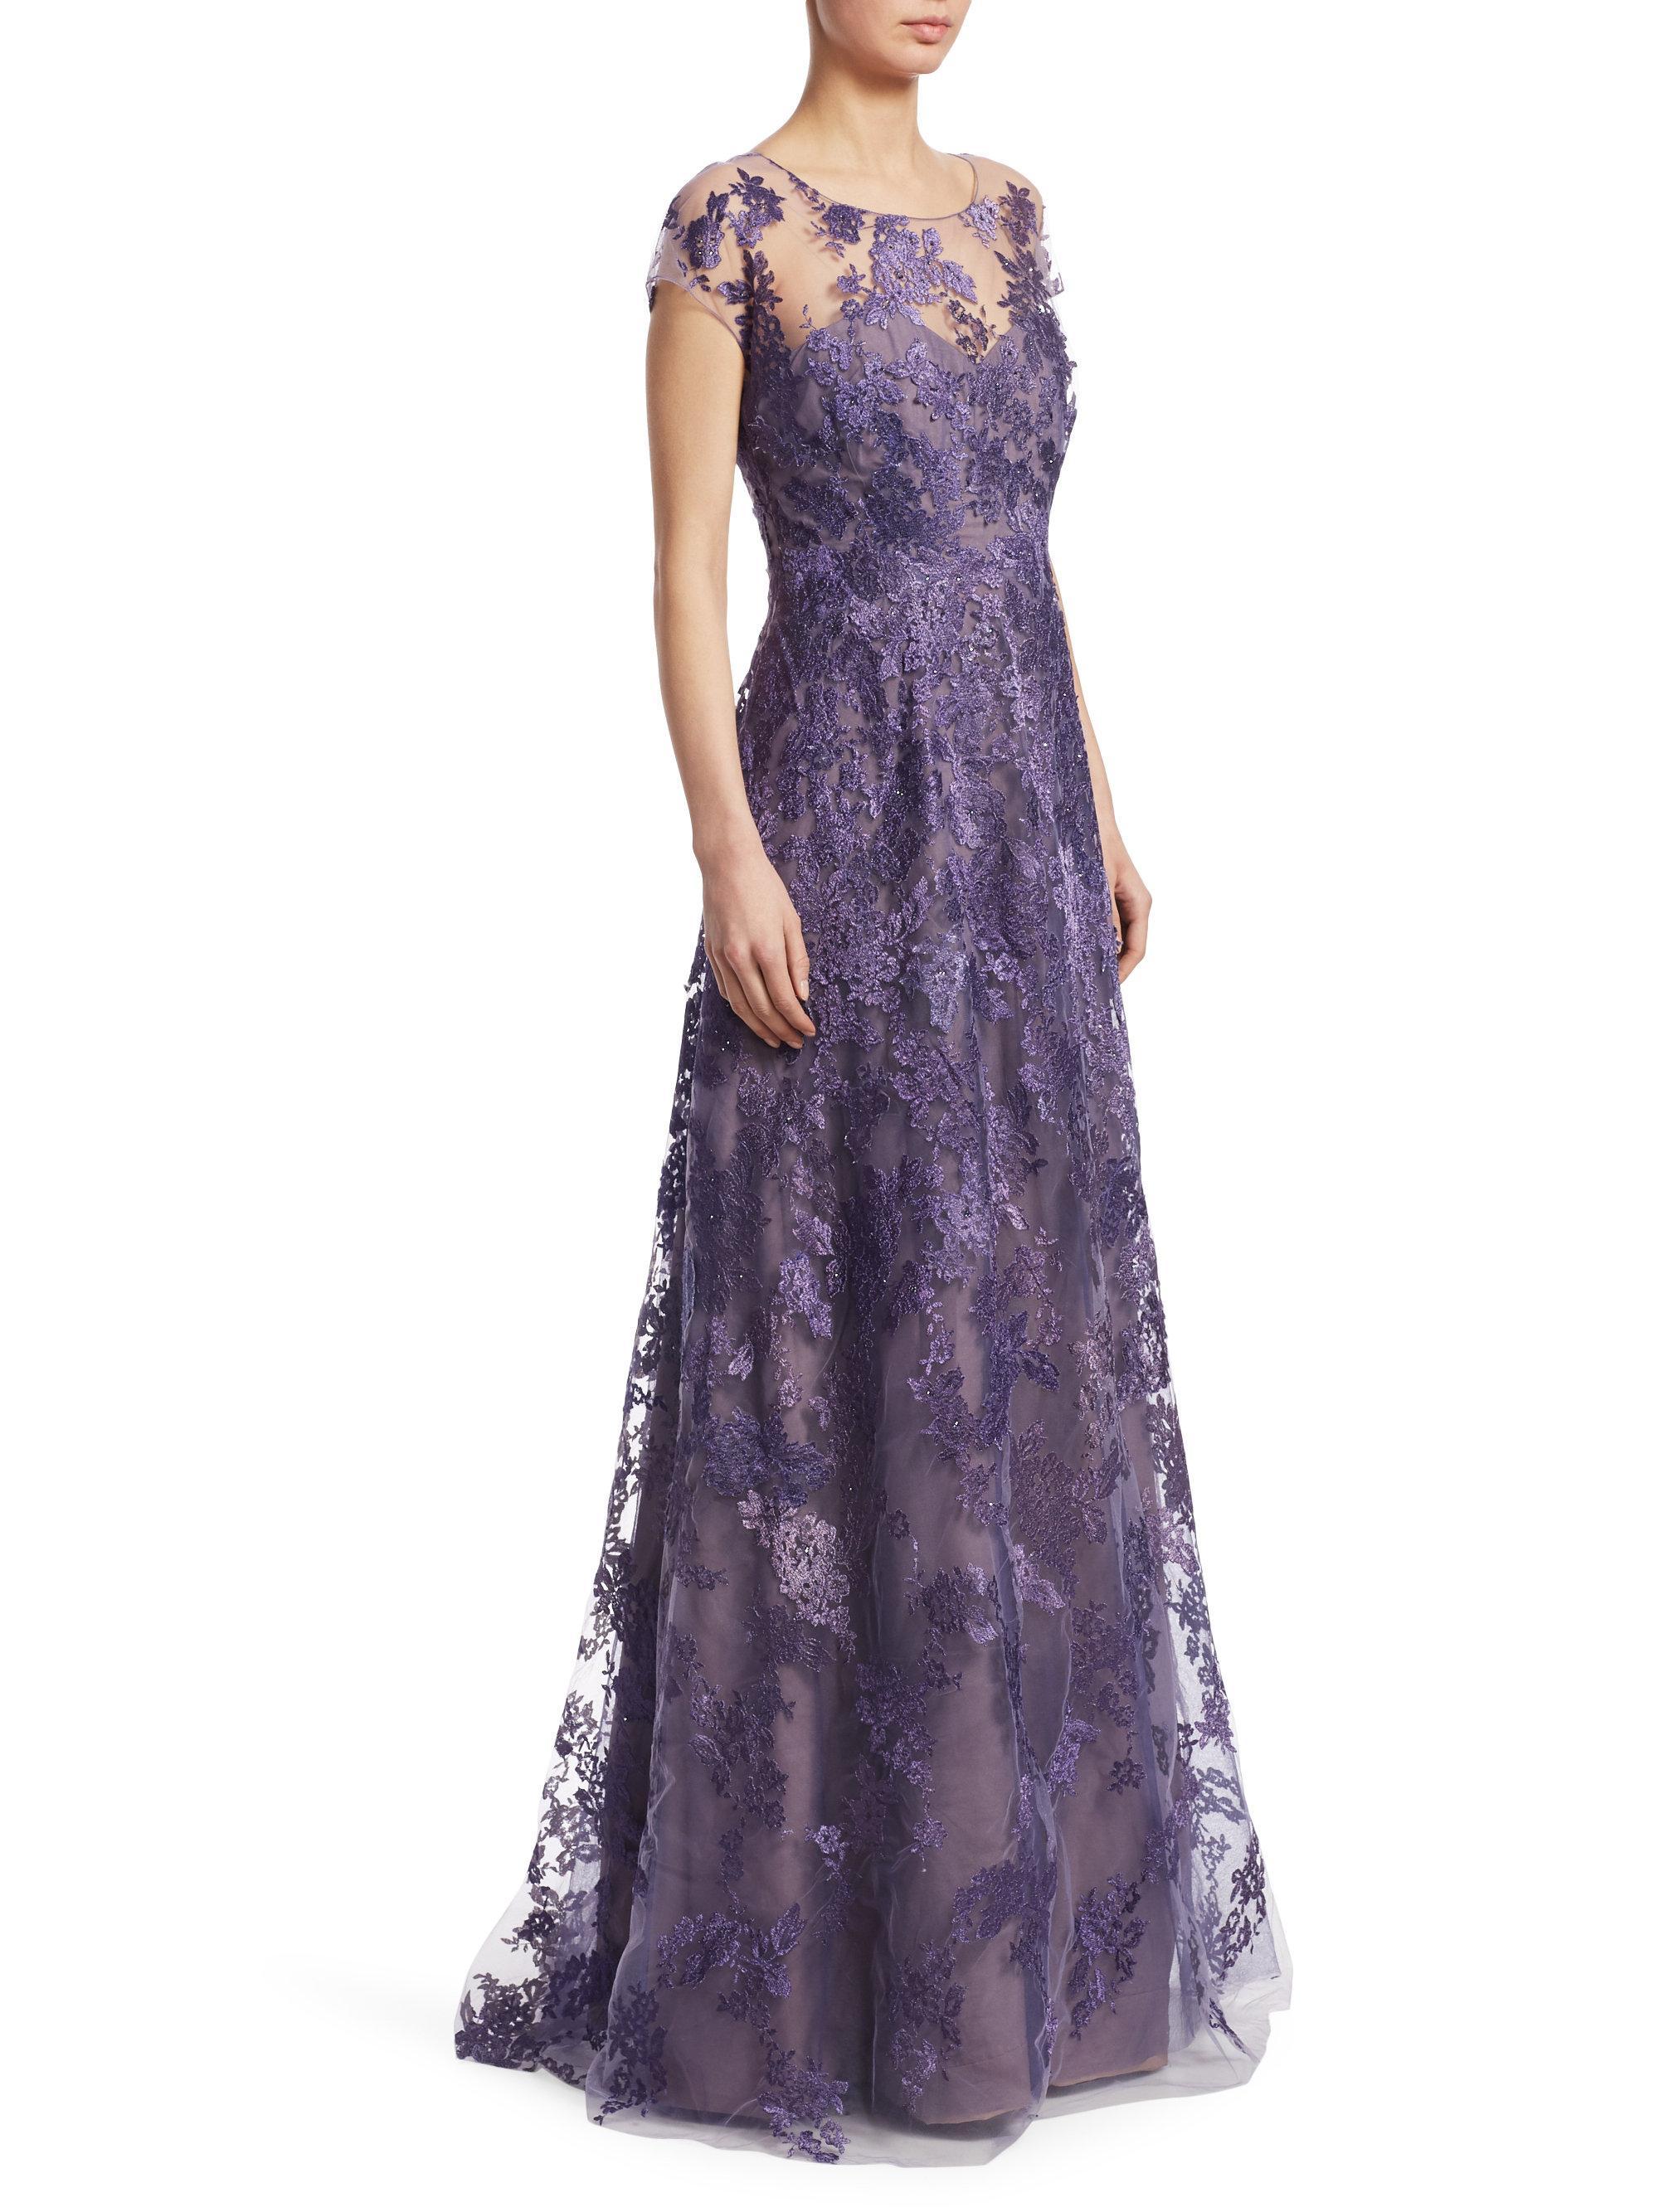 Lyst - Rene Ruiz Cap-sleeve Embellished Gown in Purple